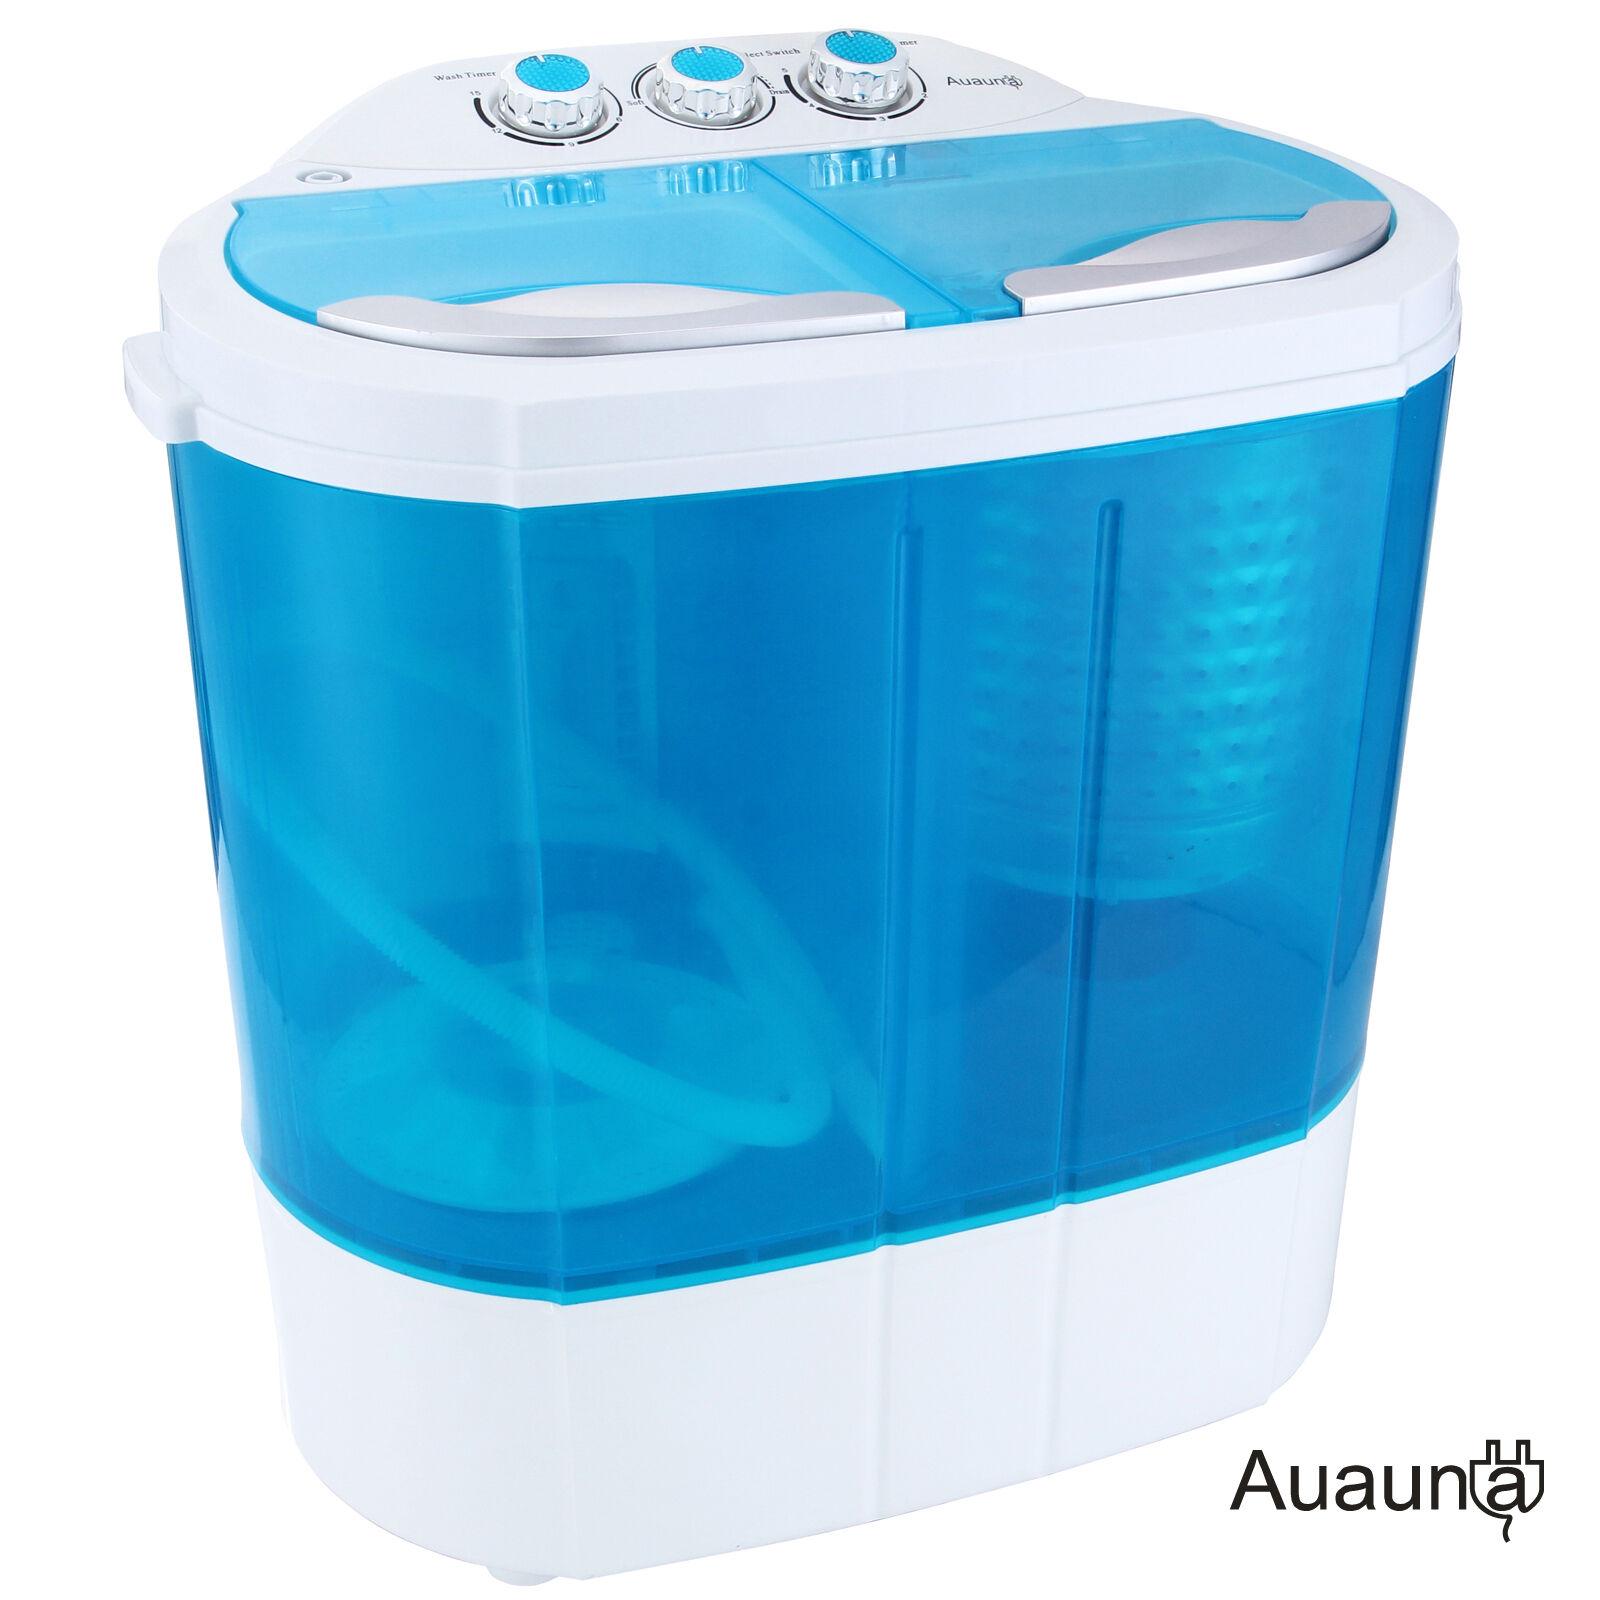 Mini Portable Rv Dorm Compact 10lbs Washing Machine Washer